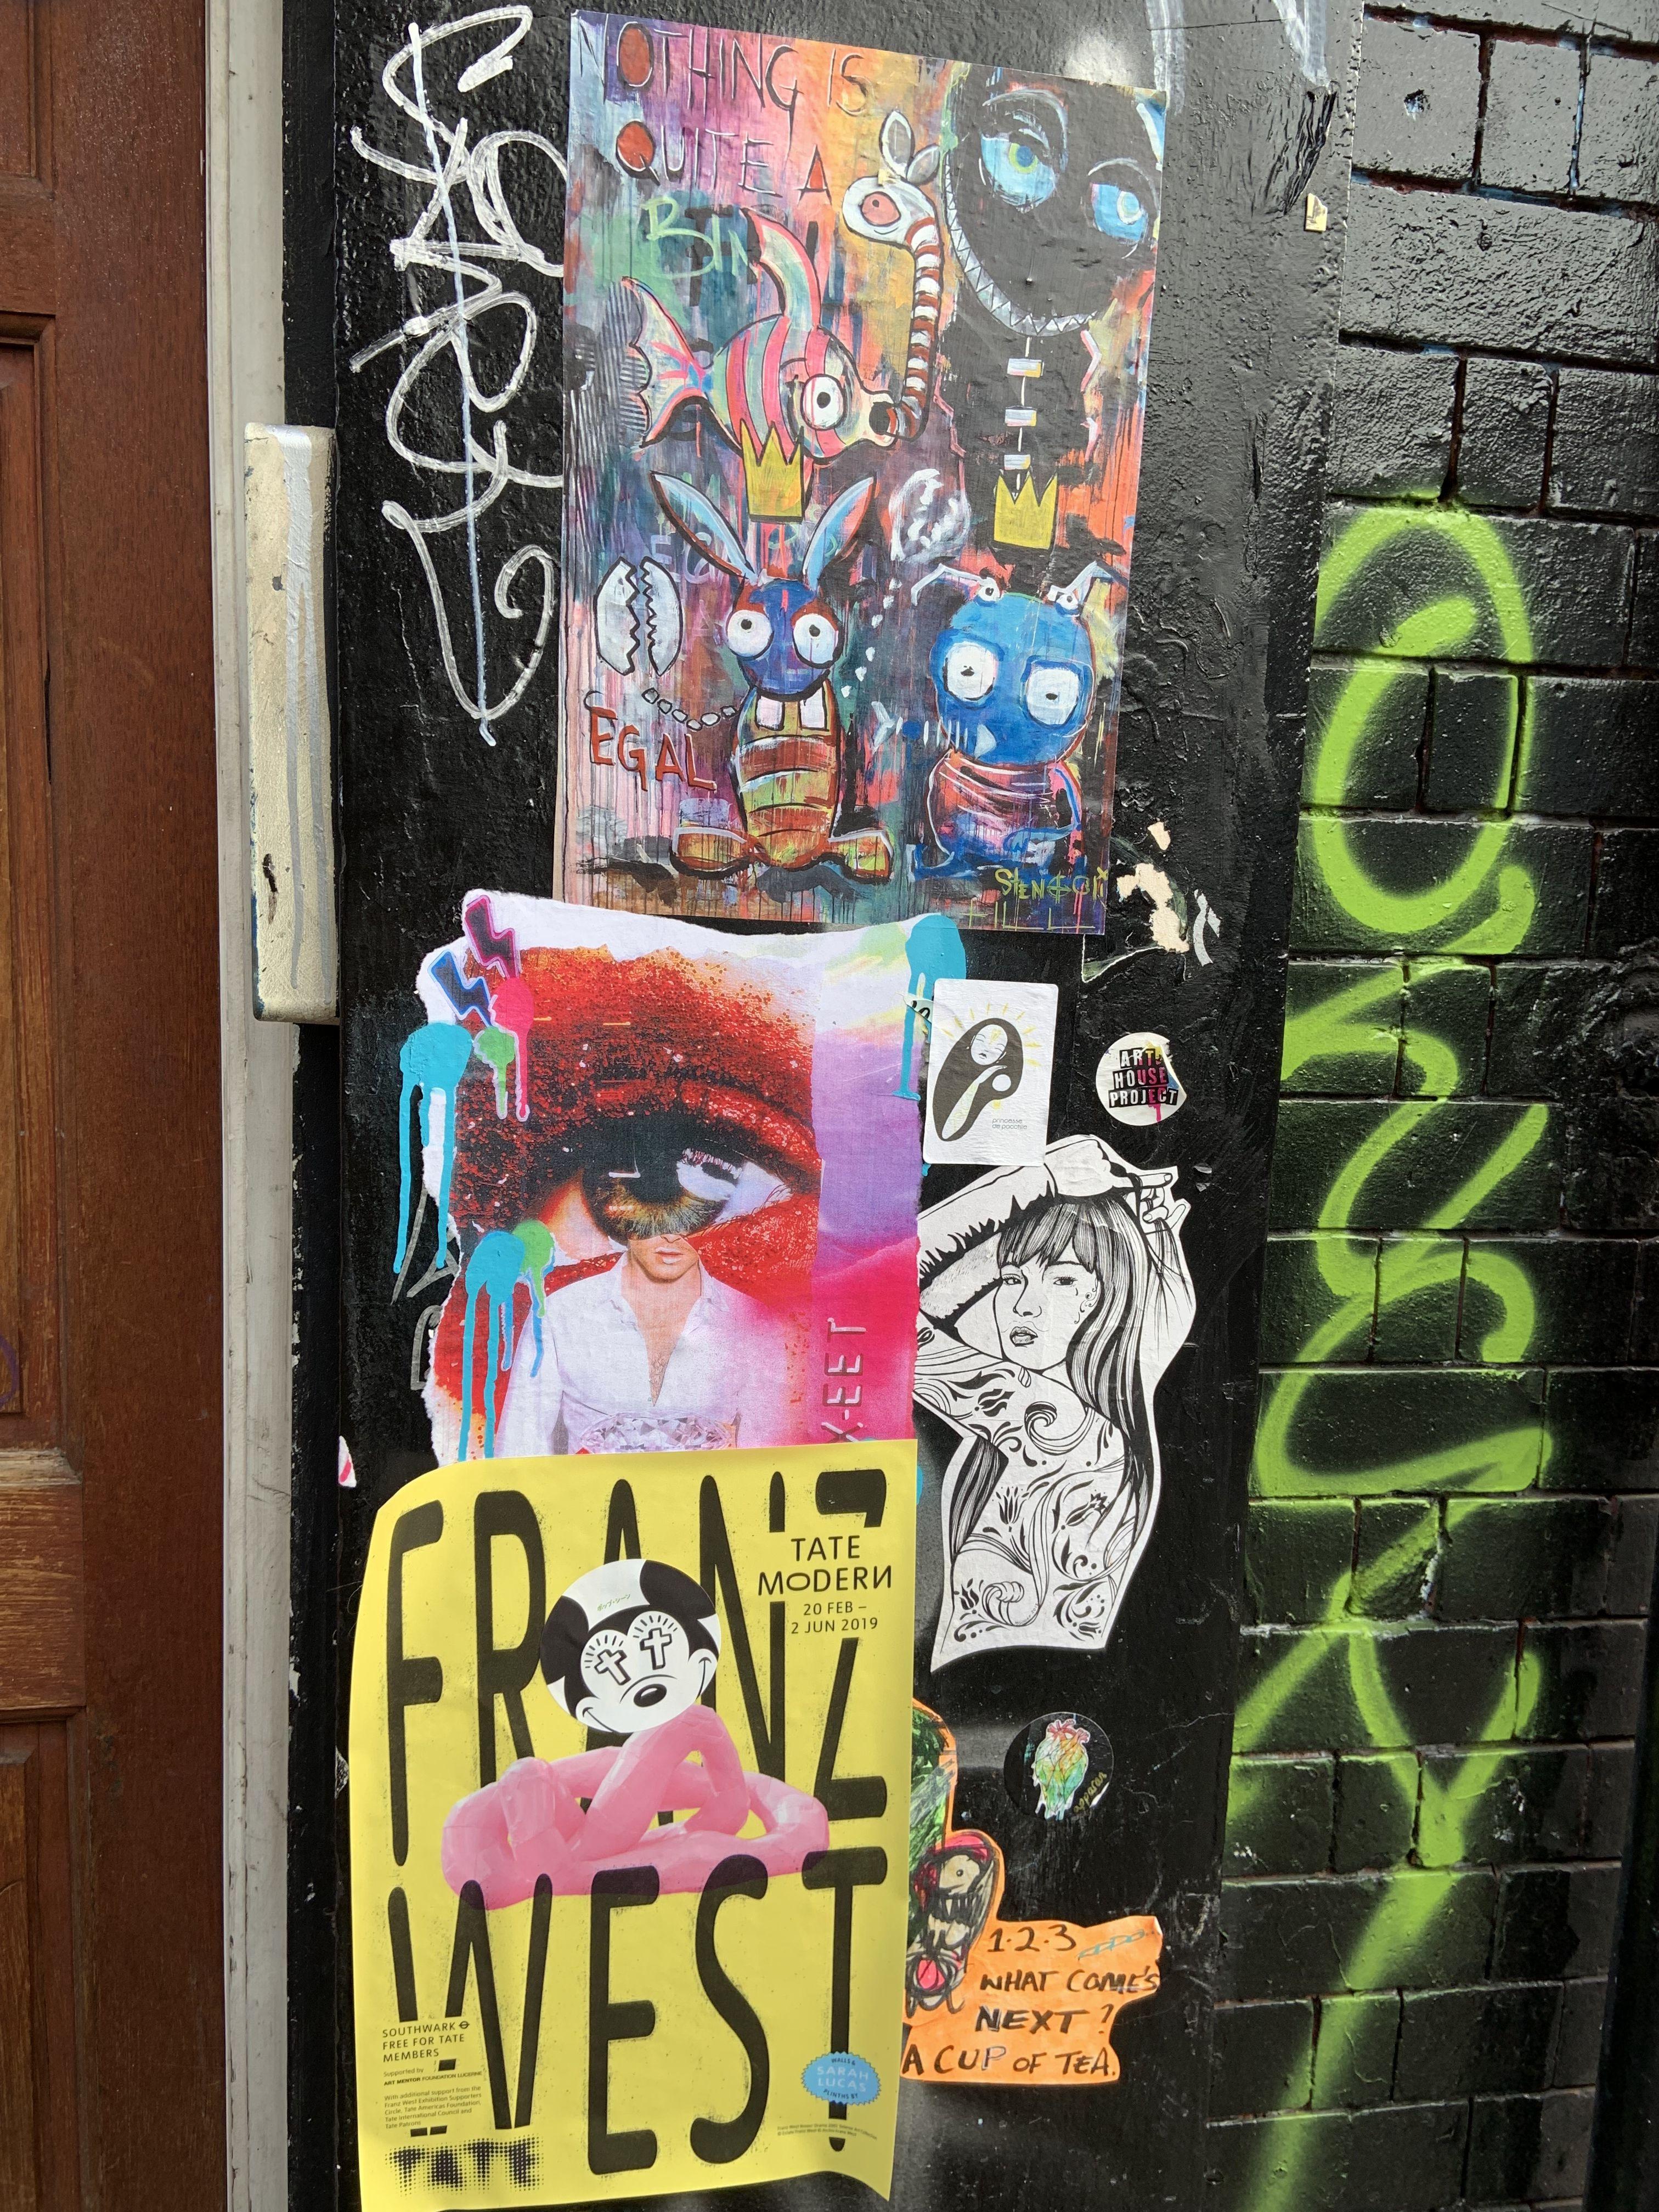 Pin by ge! on Art GCSE | Landmarks, Times square, Travel